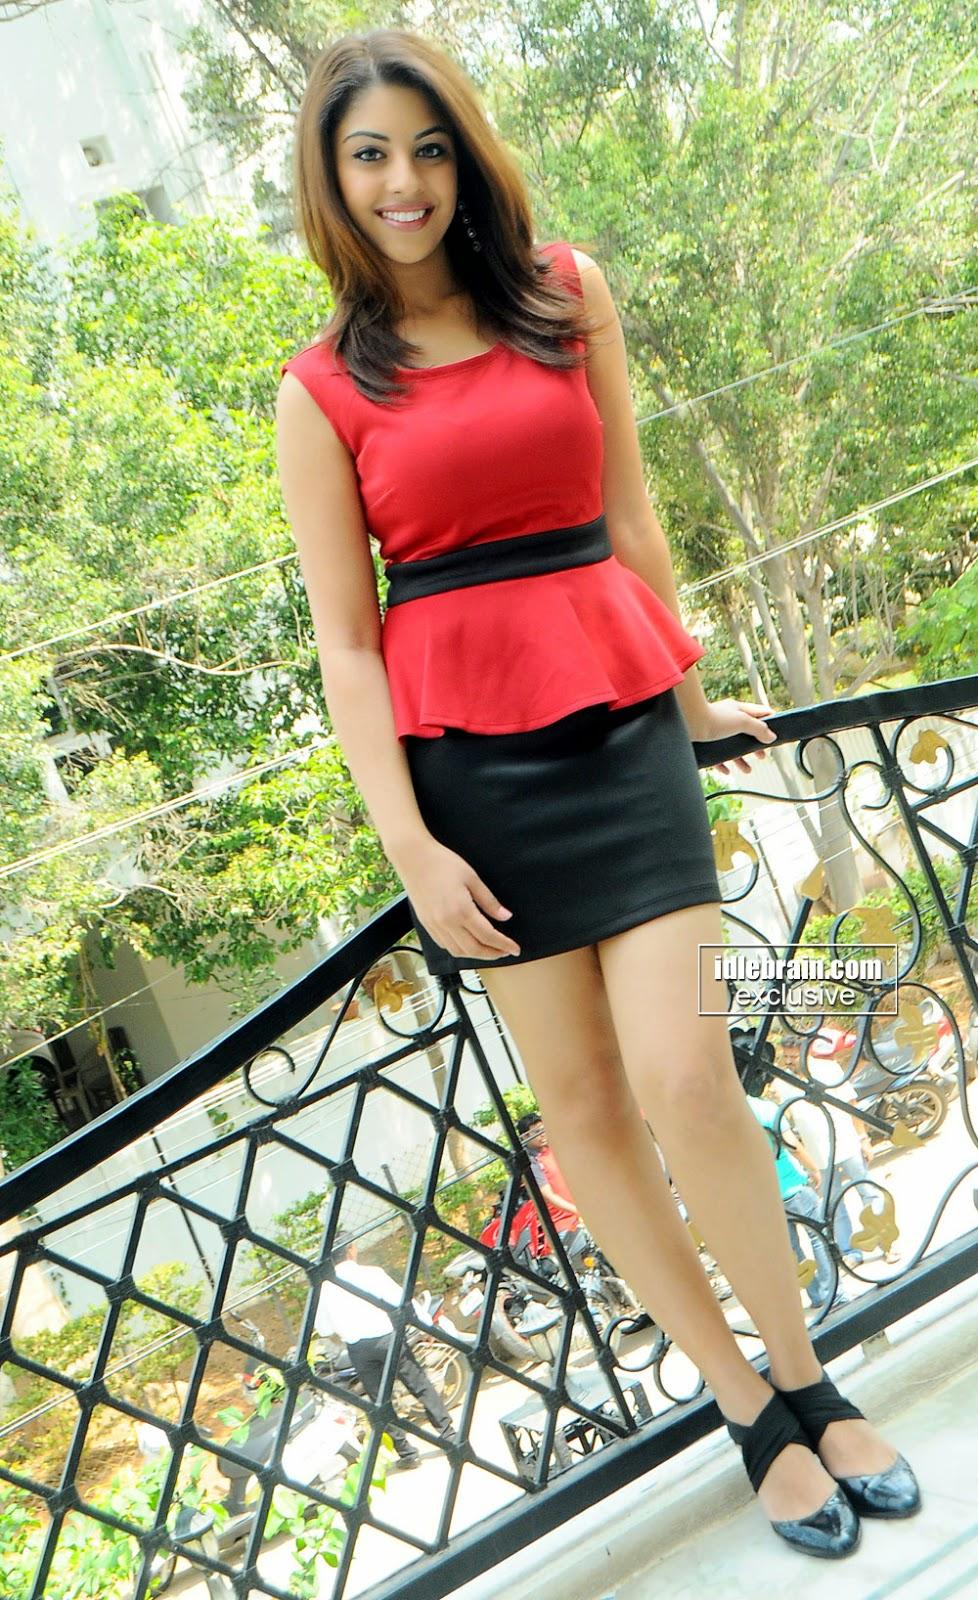 Richa Gangopadhyay outfit hot